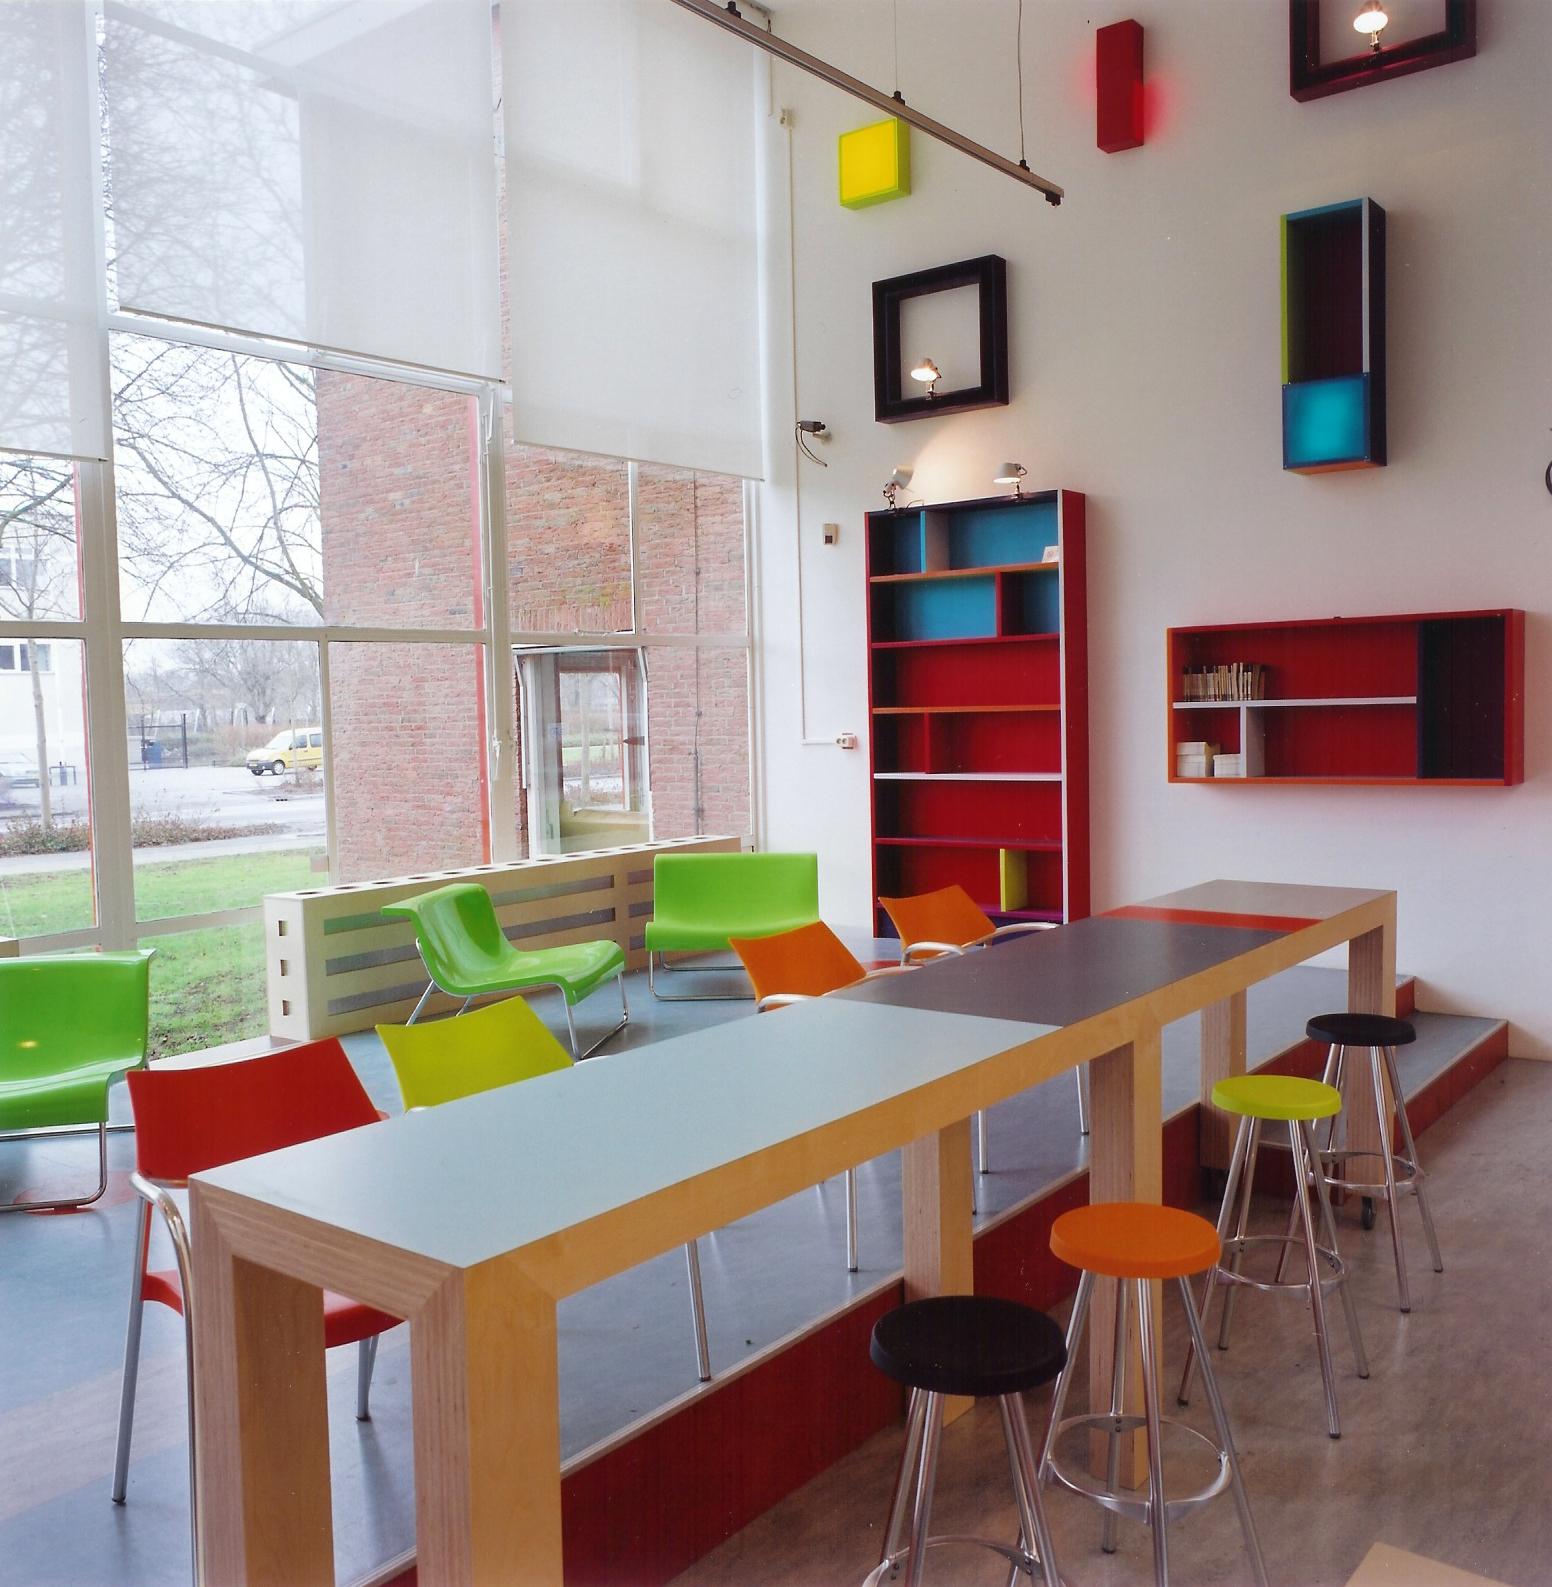 aula Regio College Purmerend (1)